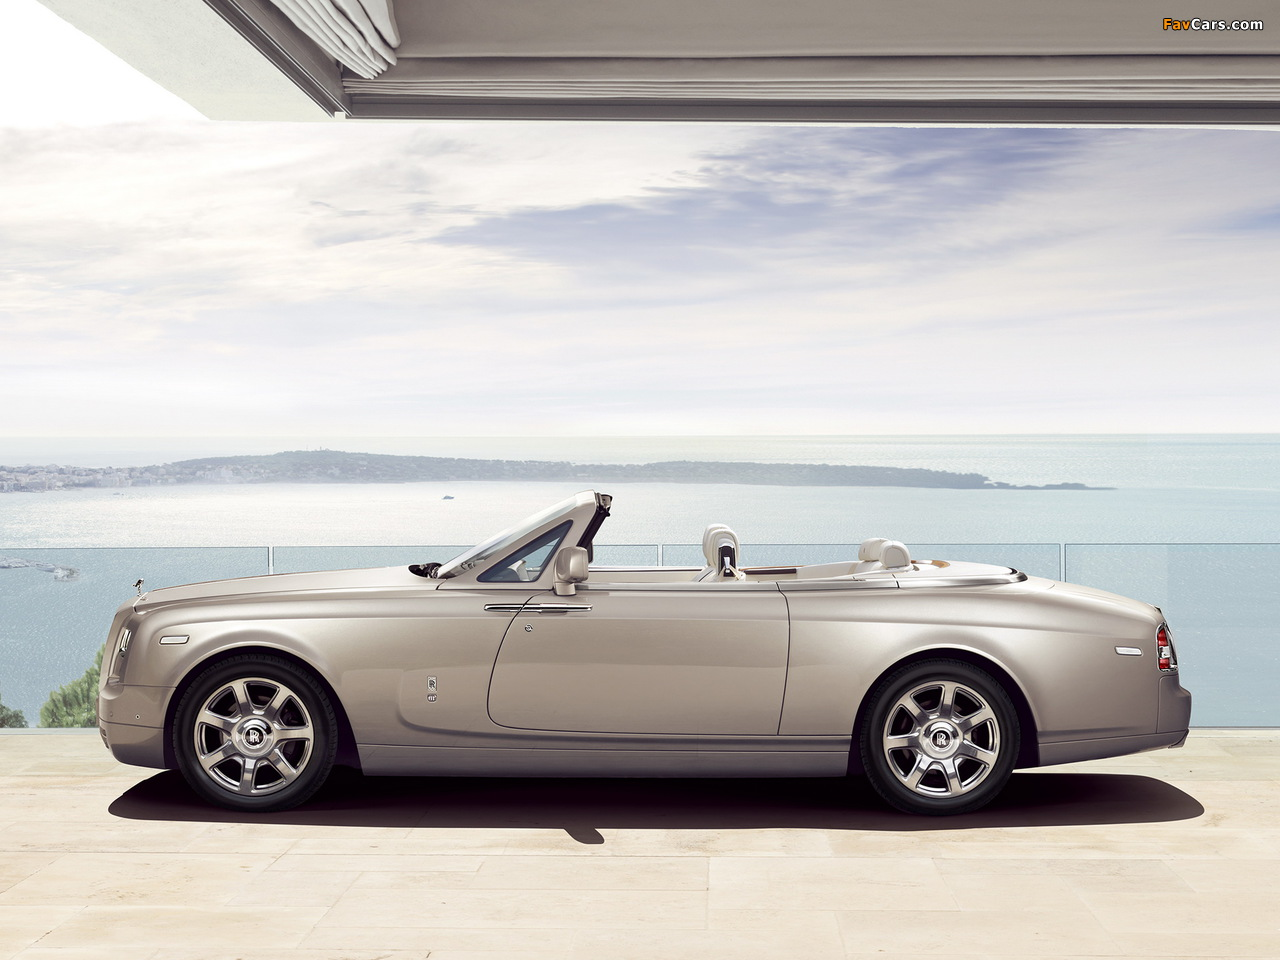 Rolls-Royce Phantom Drophead Coupe 2012 photos (1280 x 960)